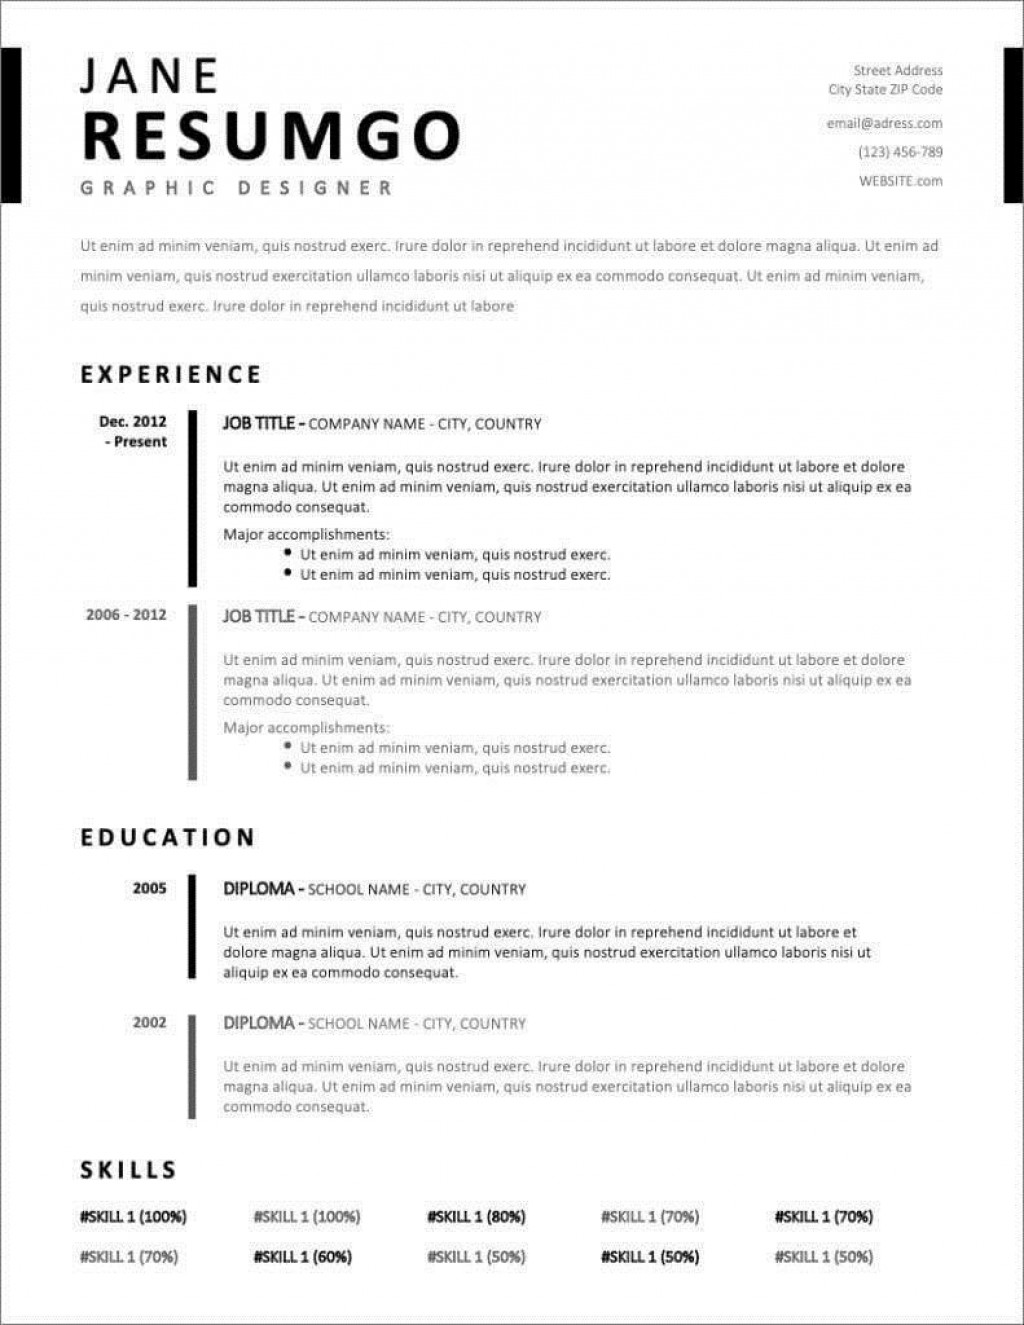 003 Wonderful Download Resume Template Free Example  For Mac Best Creative Professional Microsoft WordLarge